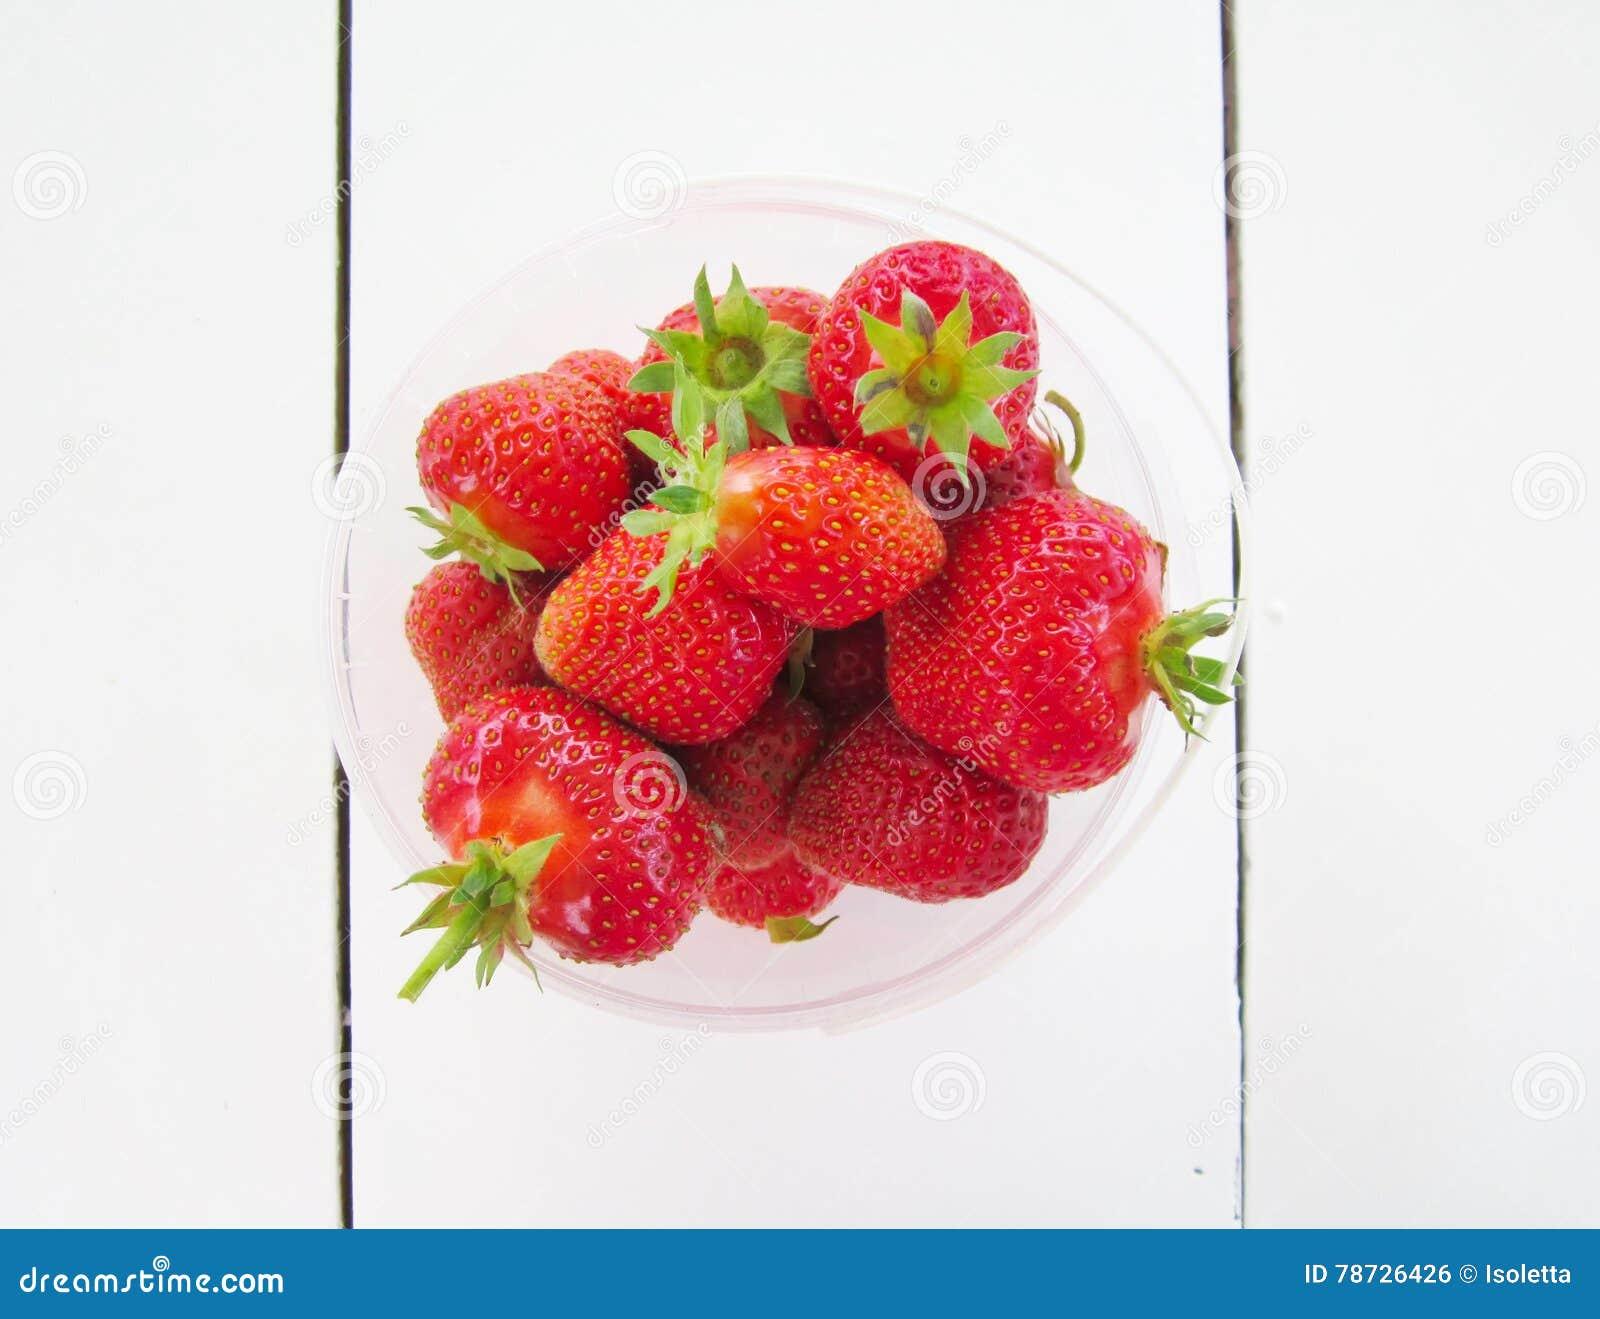 Ny mogen jordgubbe